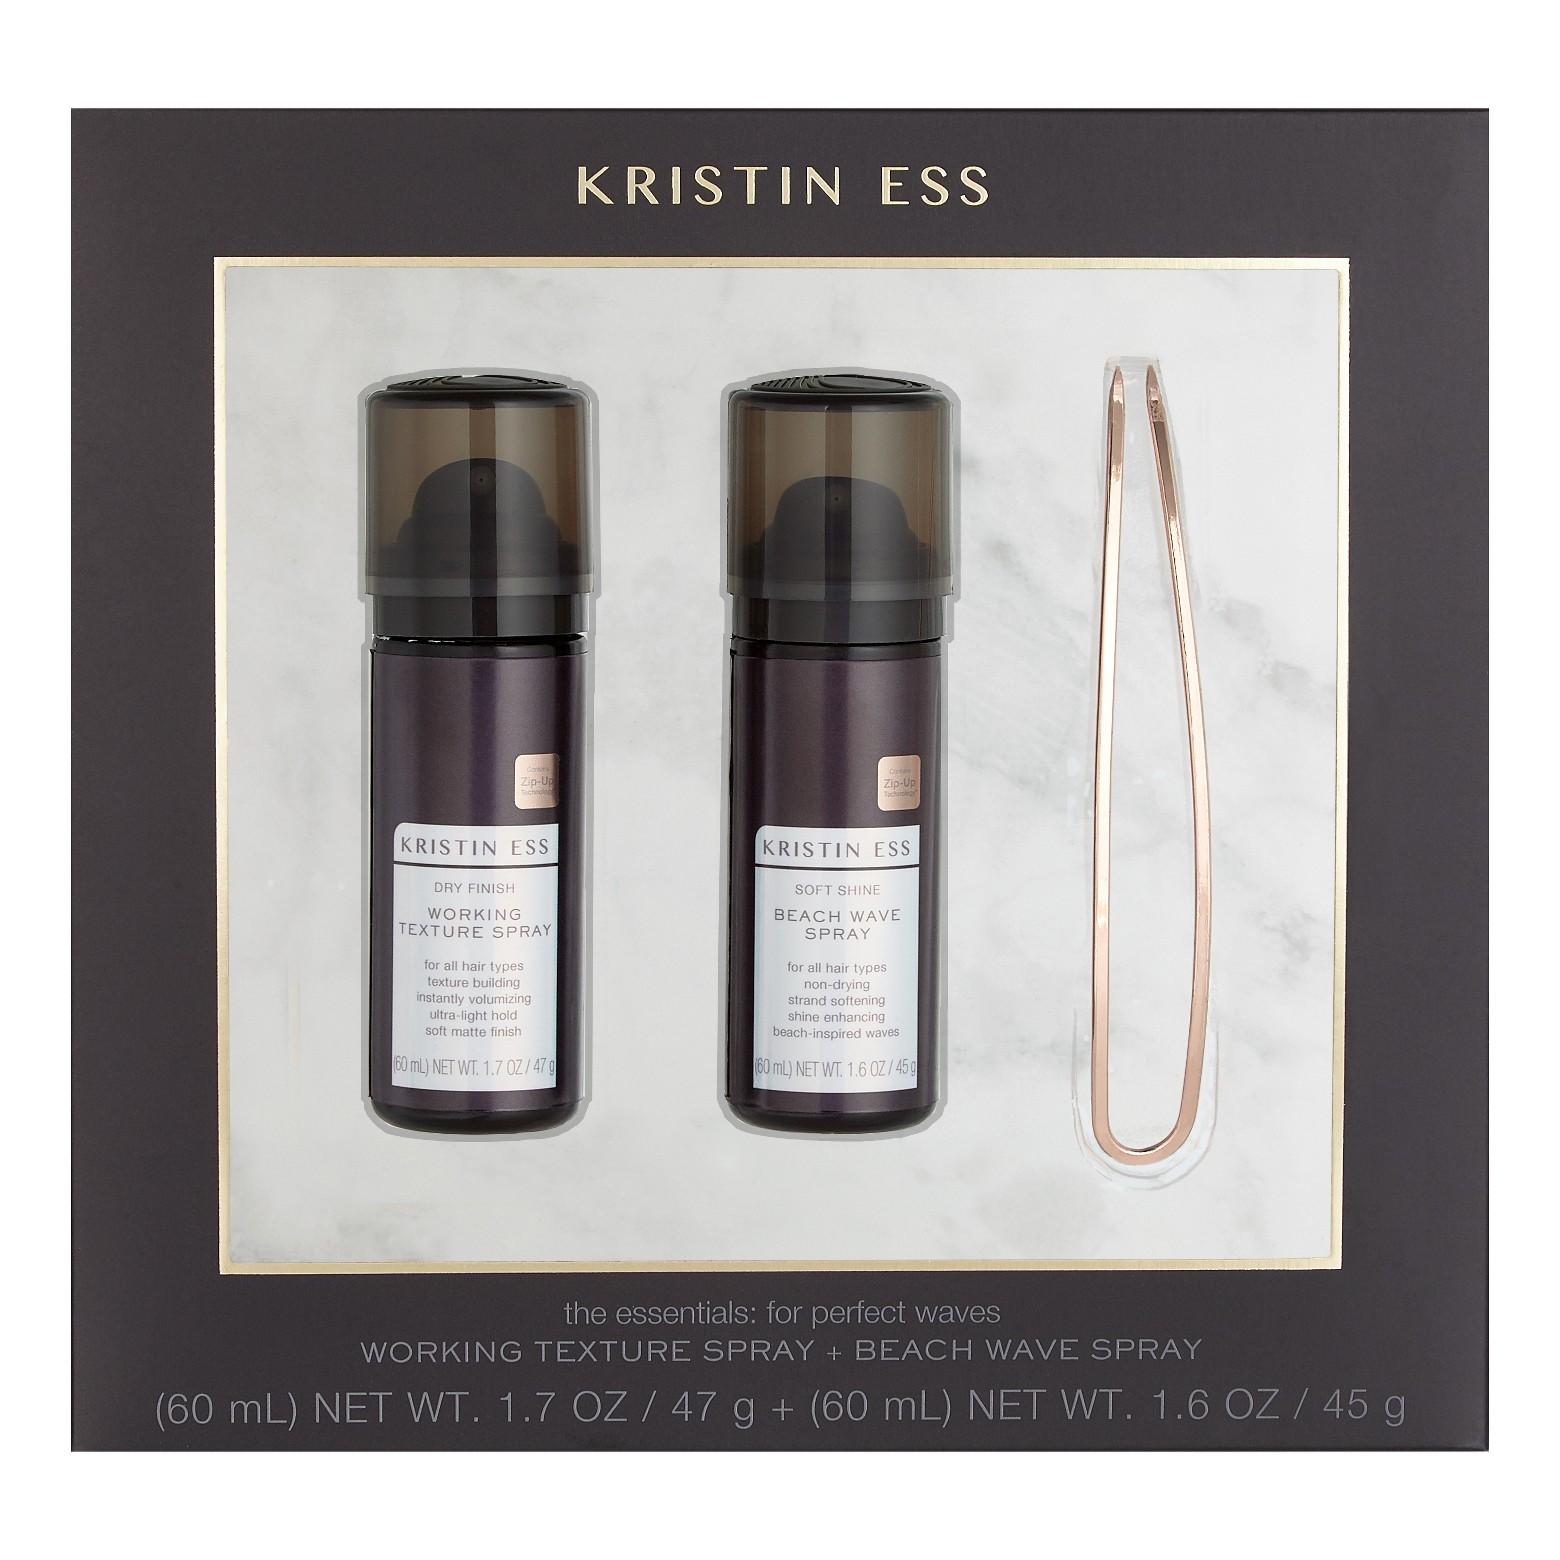 beauty_gifts_kristin_ess.jpg